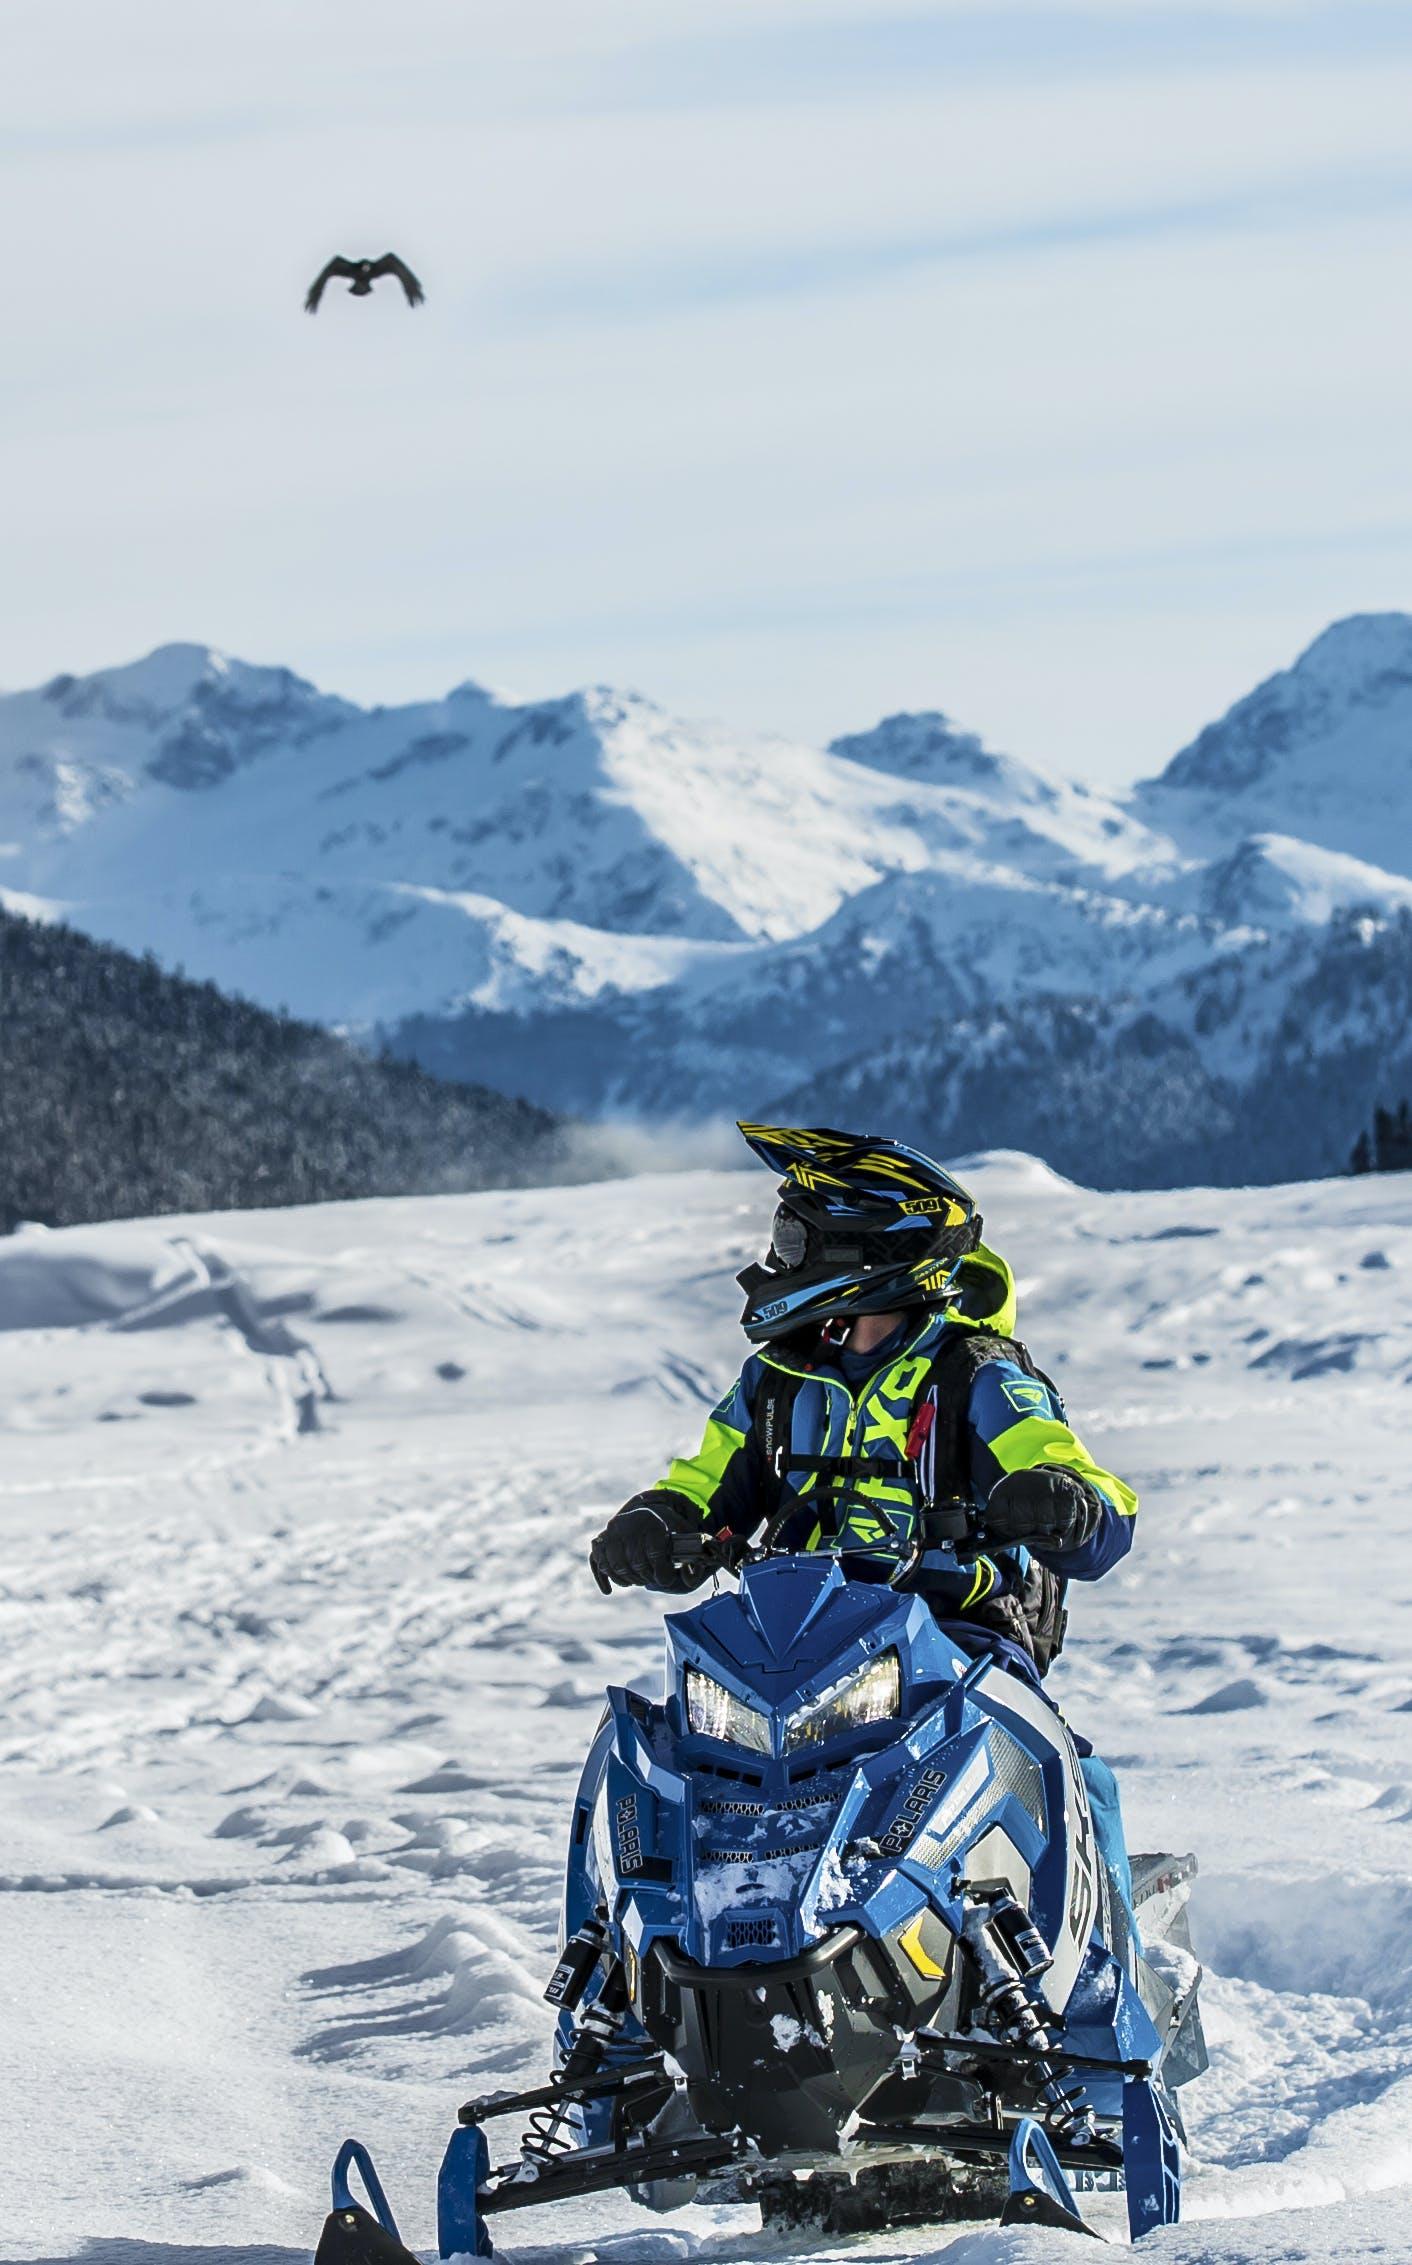 Person Riding Snowmobile